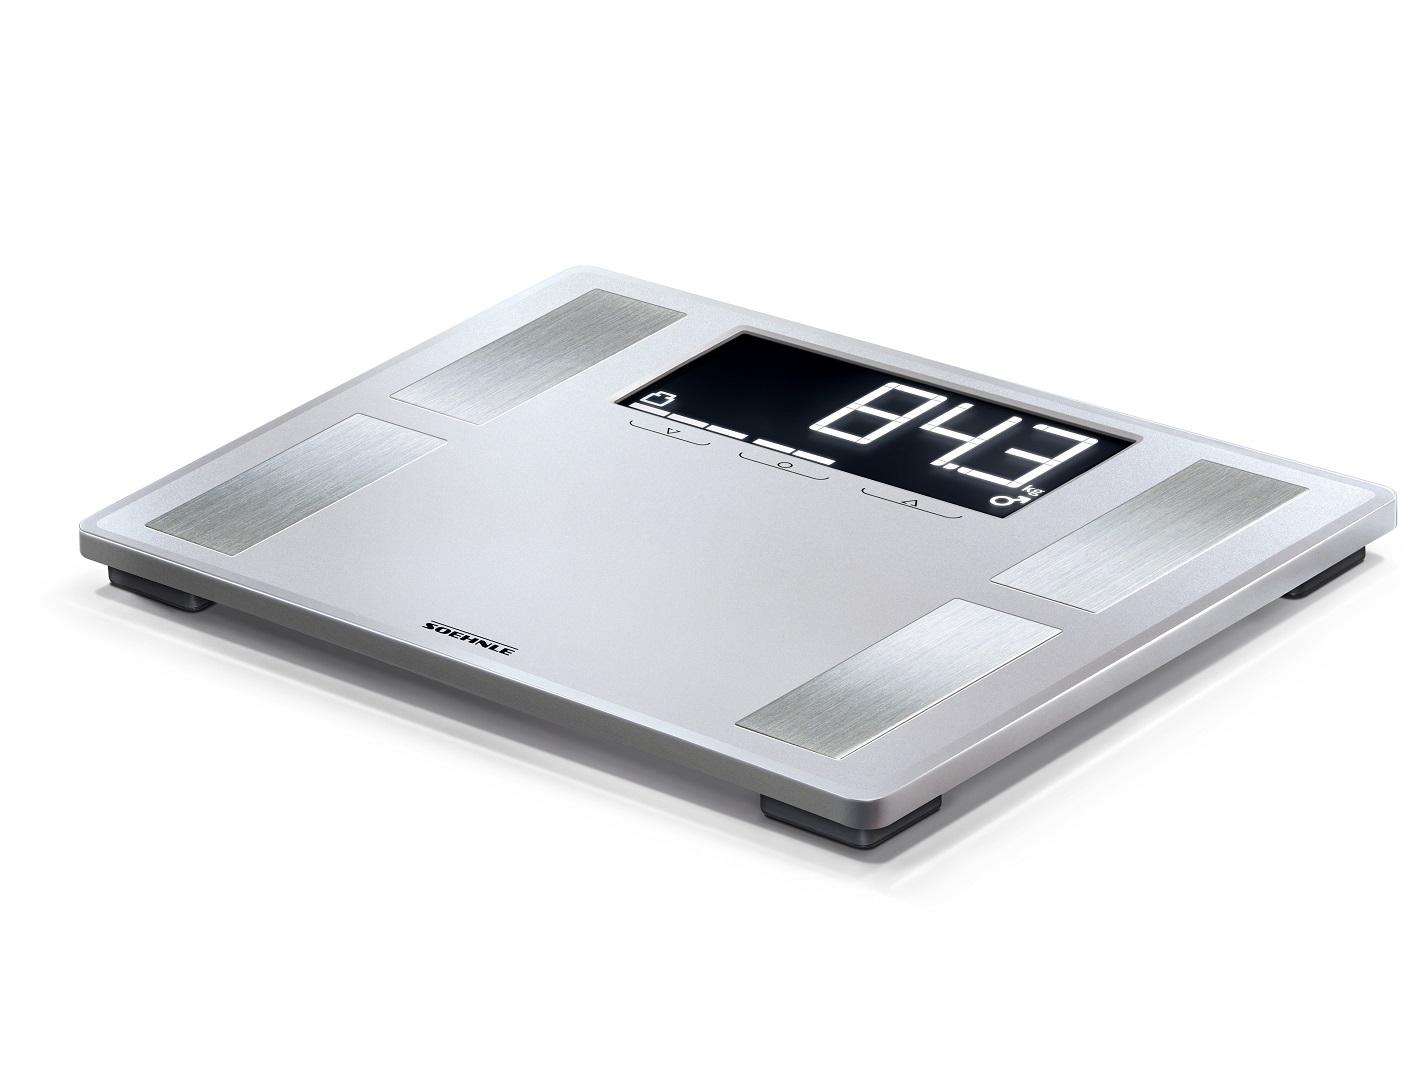 Soehnle Osobní váha SHAPE SENSE Profi 200 - digitální SOEHNLE 63870